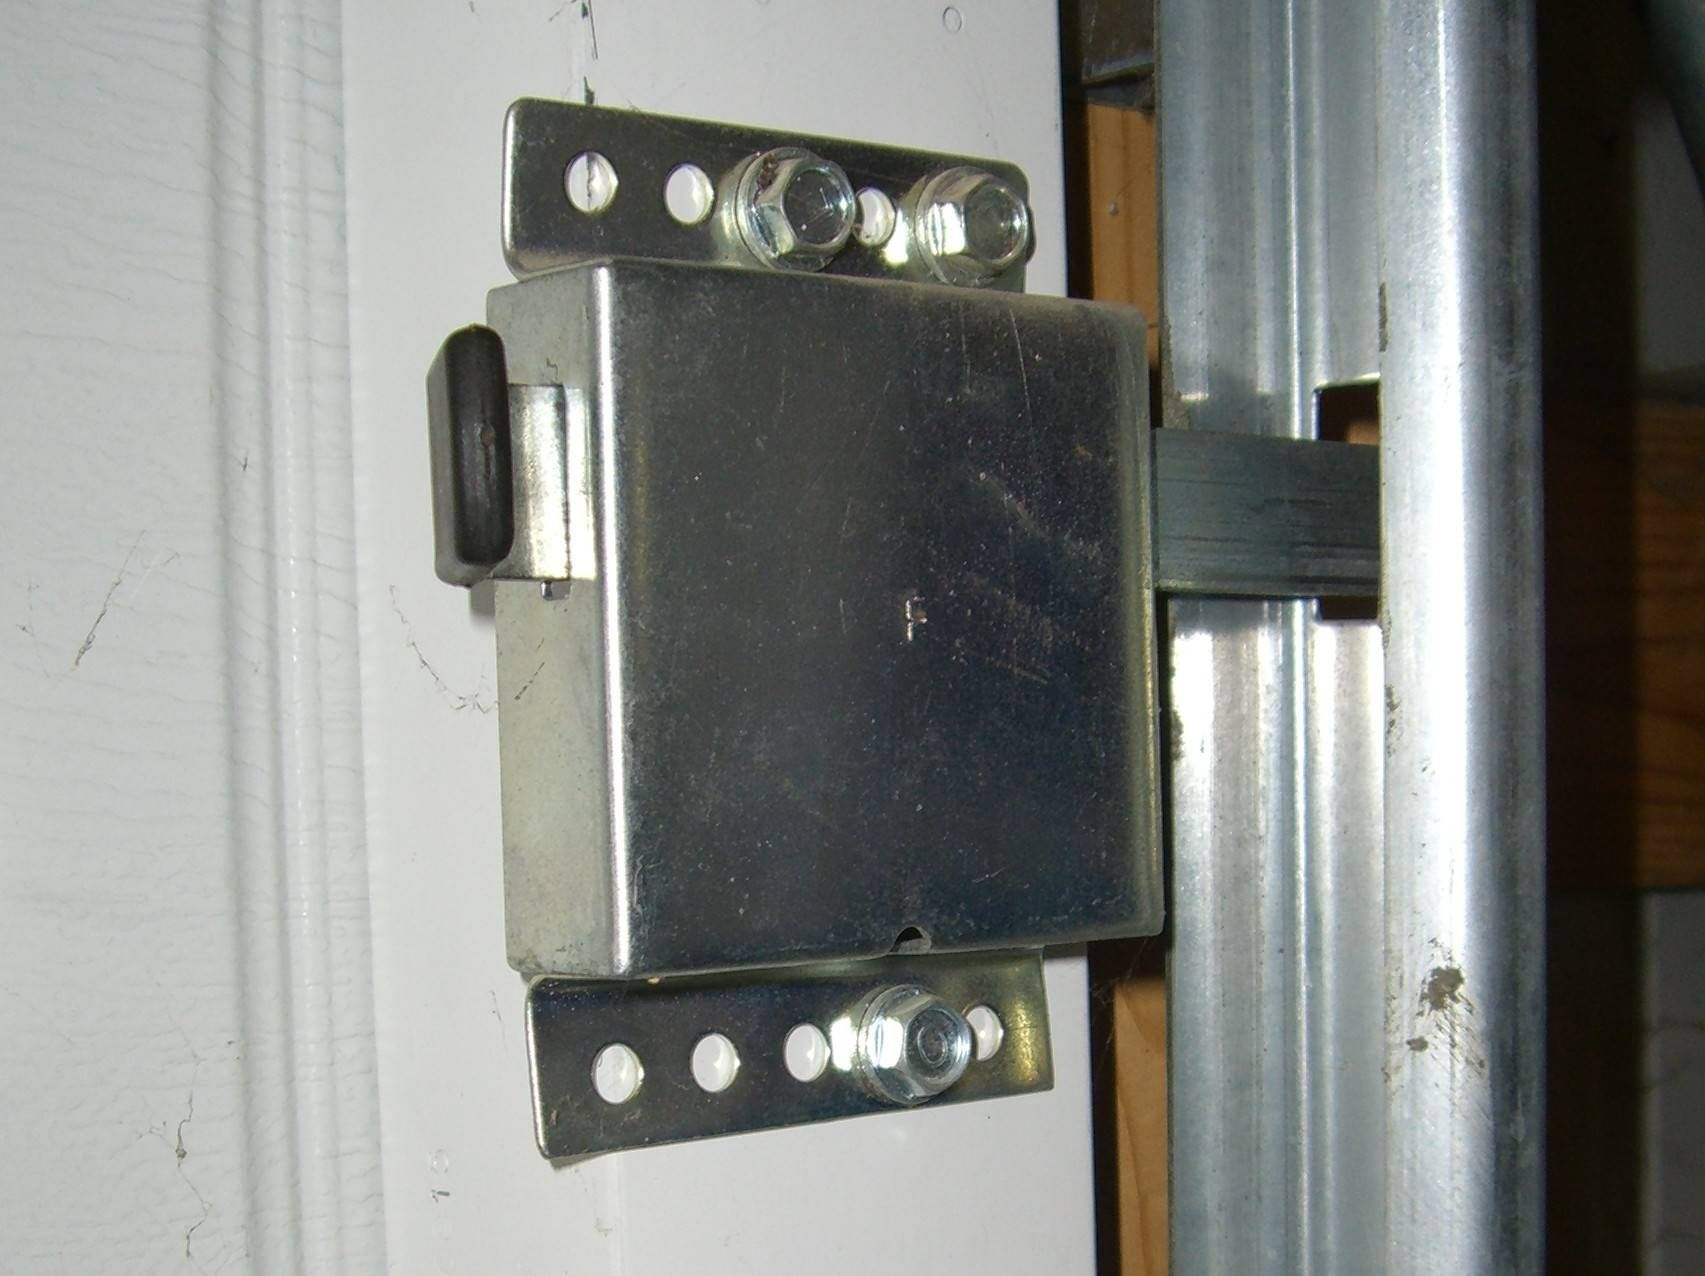 Securing Sliding Garage Doors & Securing Sliding Garage Doors | http://voteno123.com | Pinterest ...